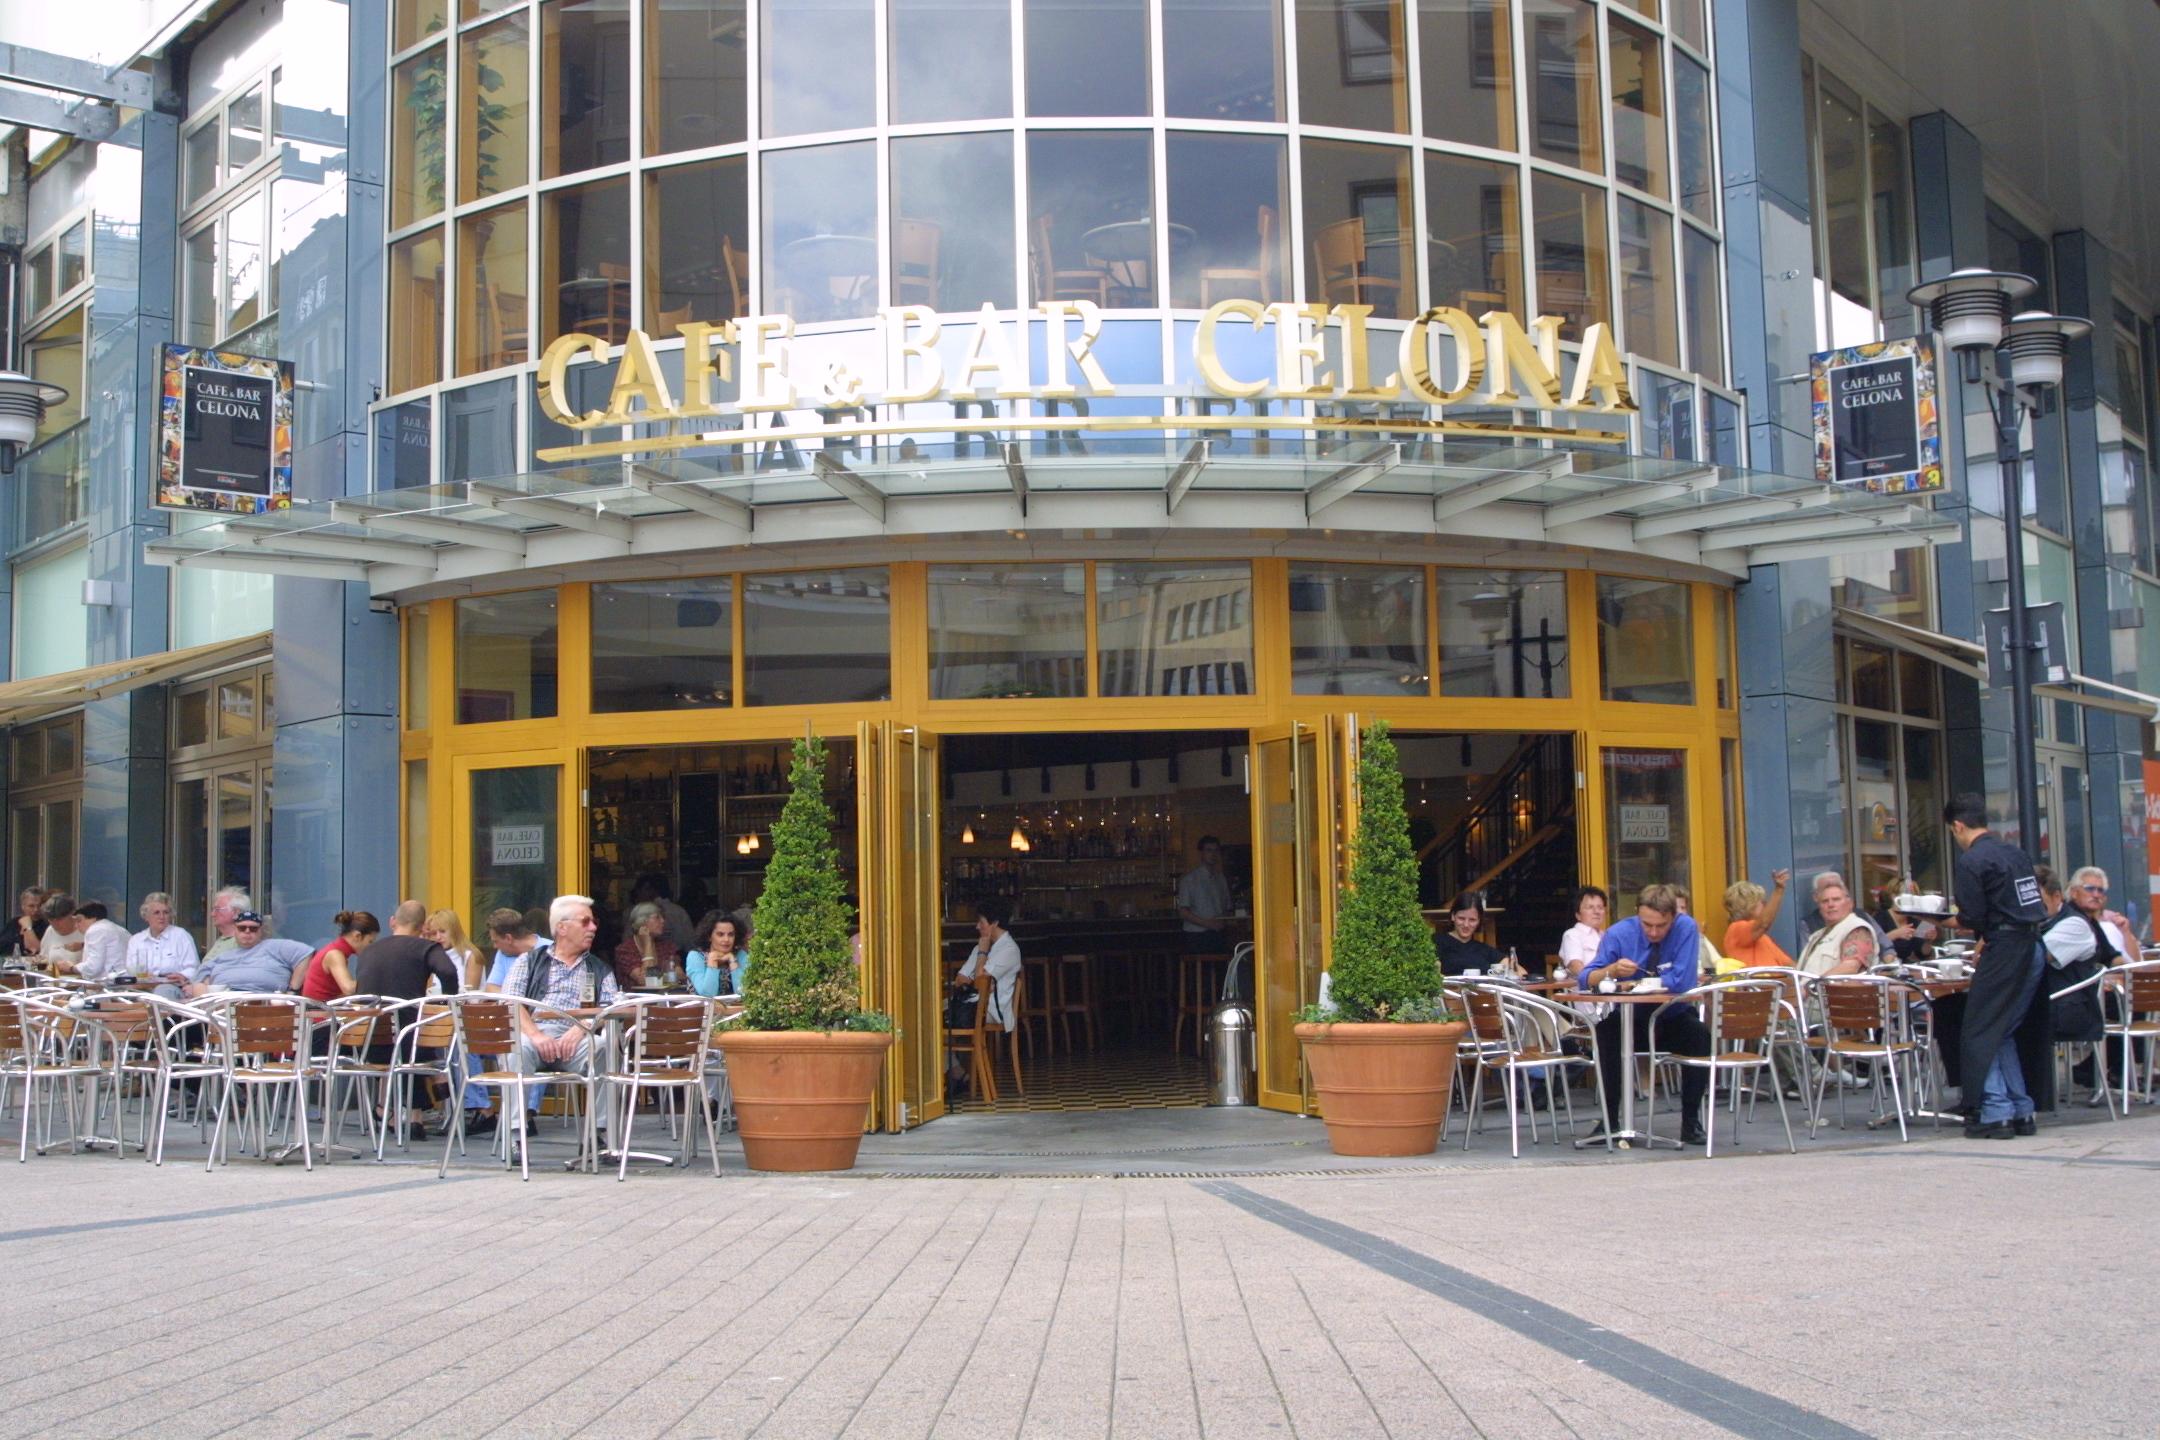 Finca Barcelona Bielefeld bar celona bielefeld ricardo bofill ucwhy are historical towns more